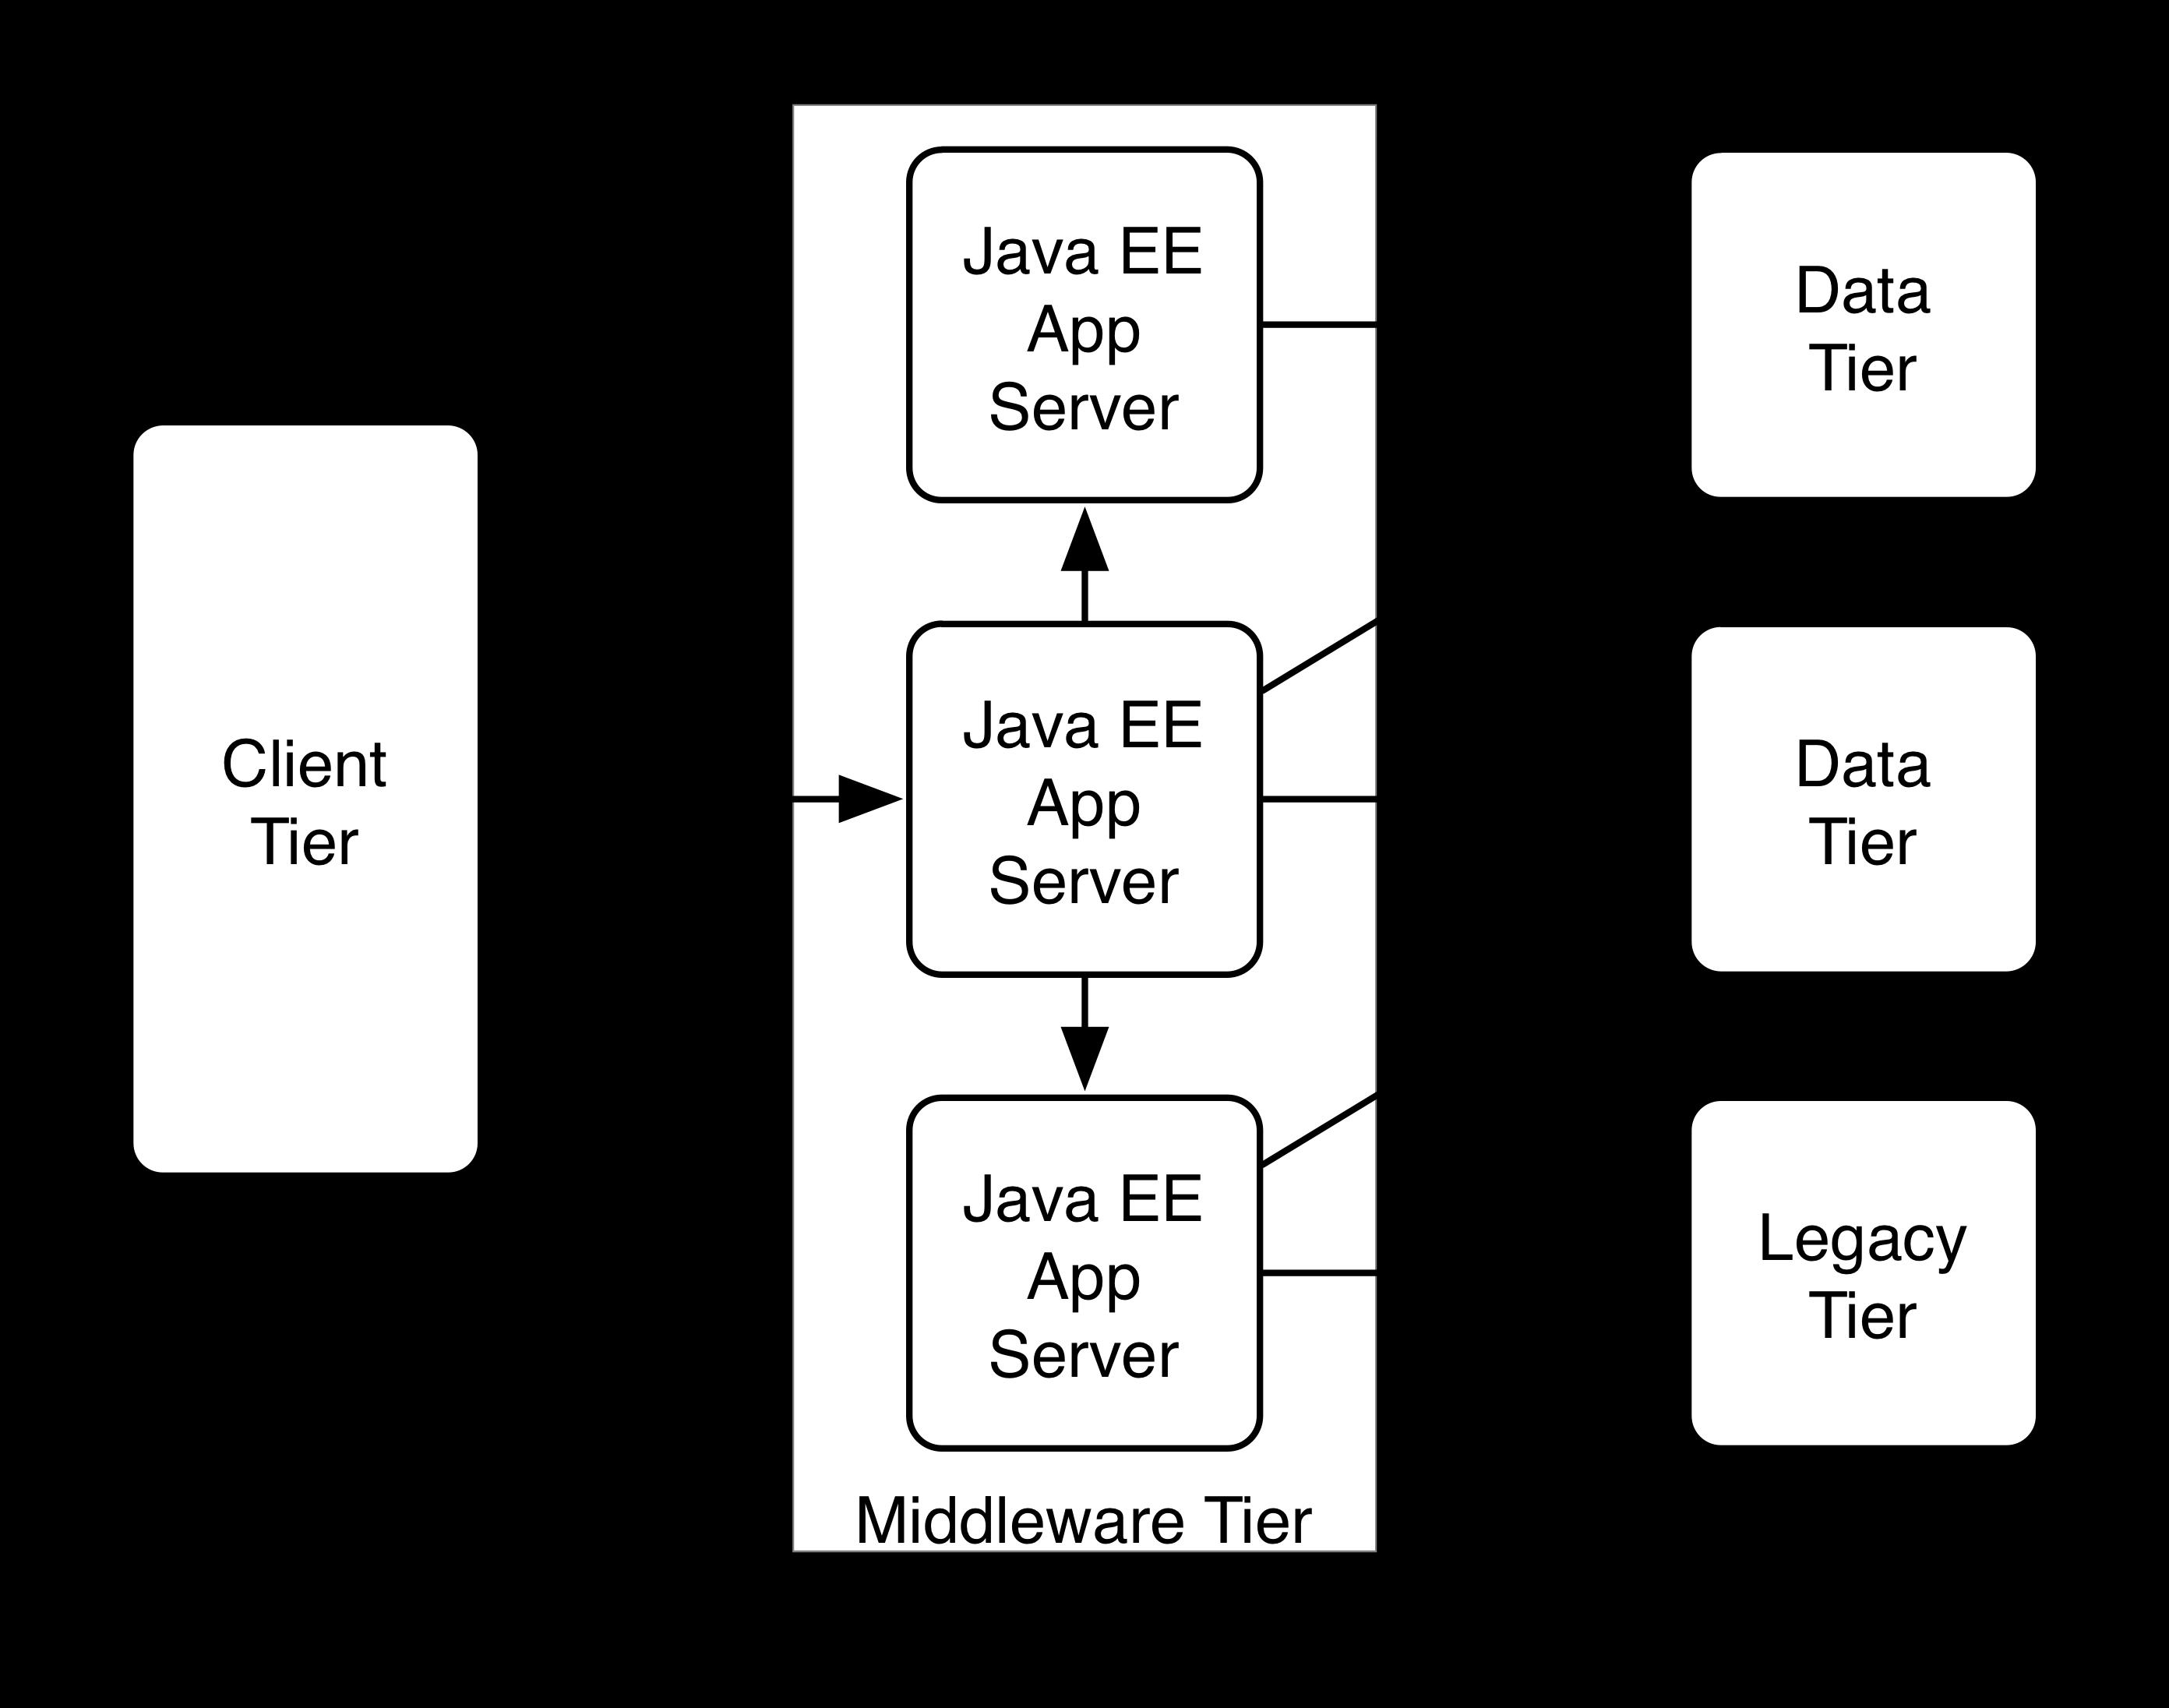 Jboss Admin Tutorial: Overview of Java Enterprise Edition